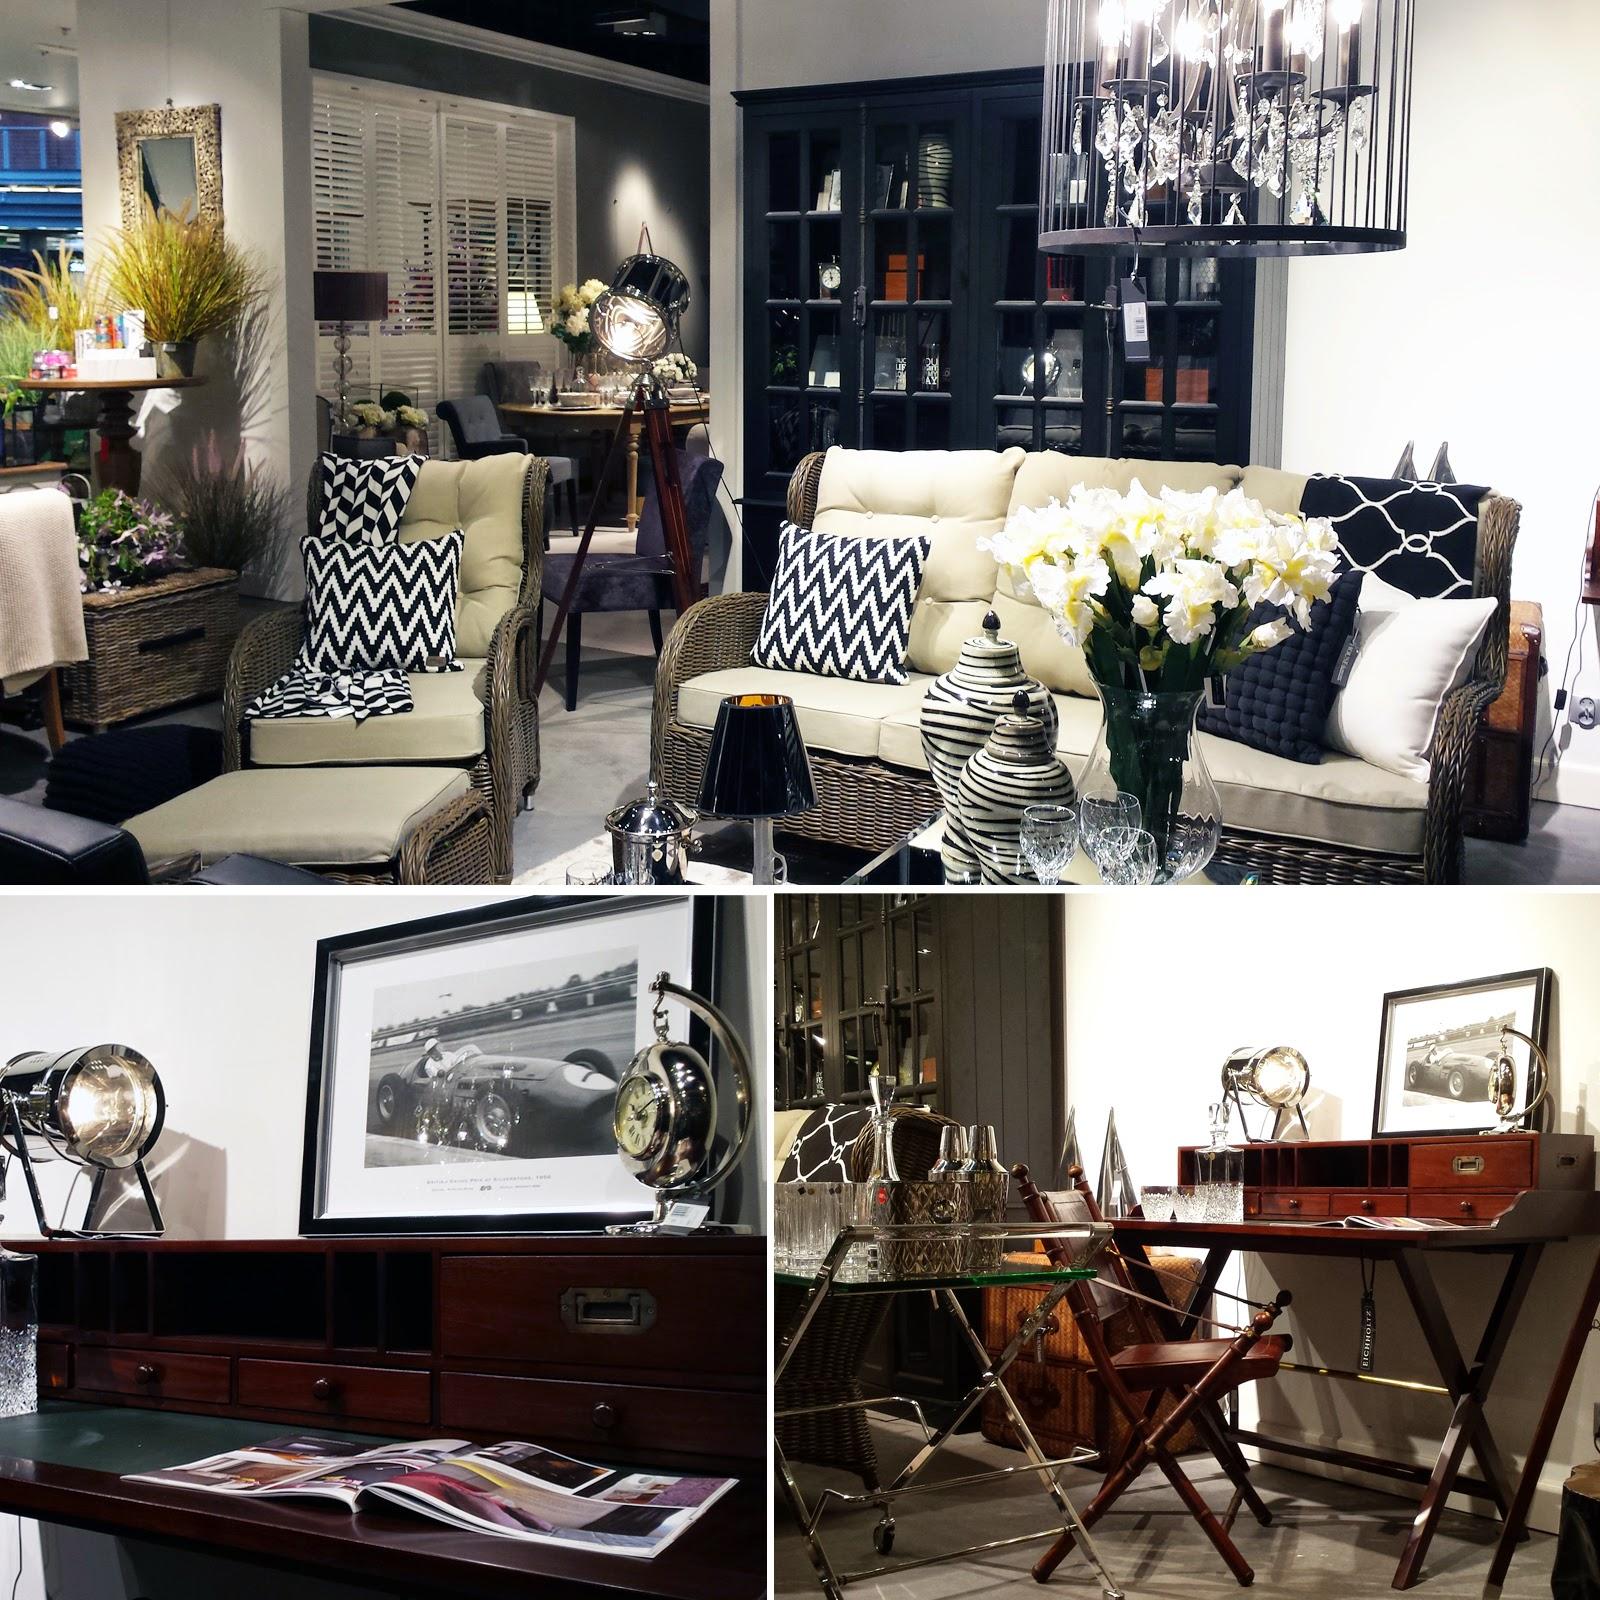 Dacon-Design-interiors-House&More-Miloo-Manutti-Eichholtz-Flamat-Pomax-Riviera Maison-Grand Design-meble skandynawskie-ogrodowe-czarno-białe-wzory